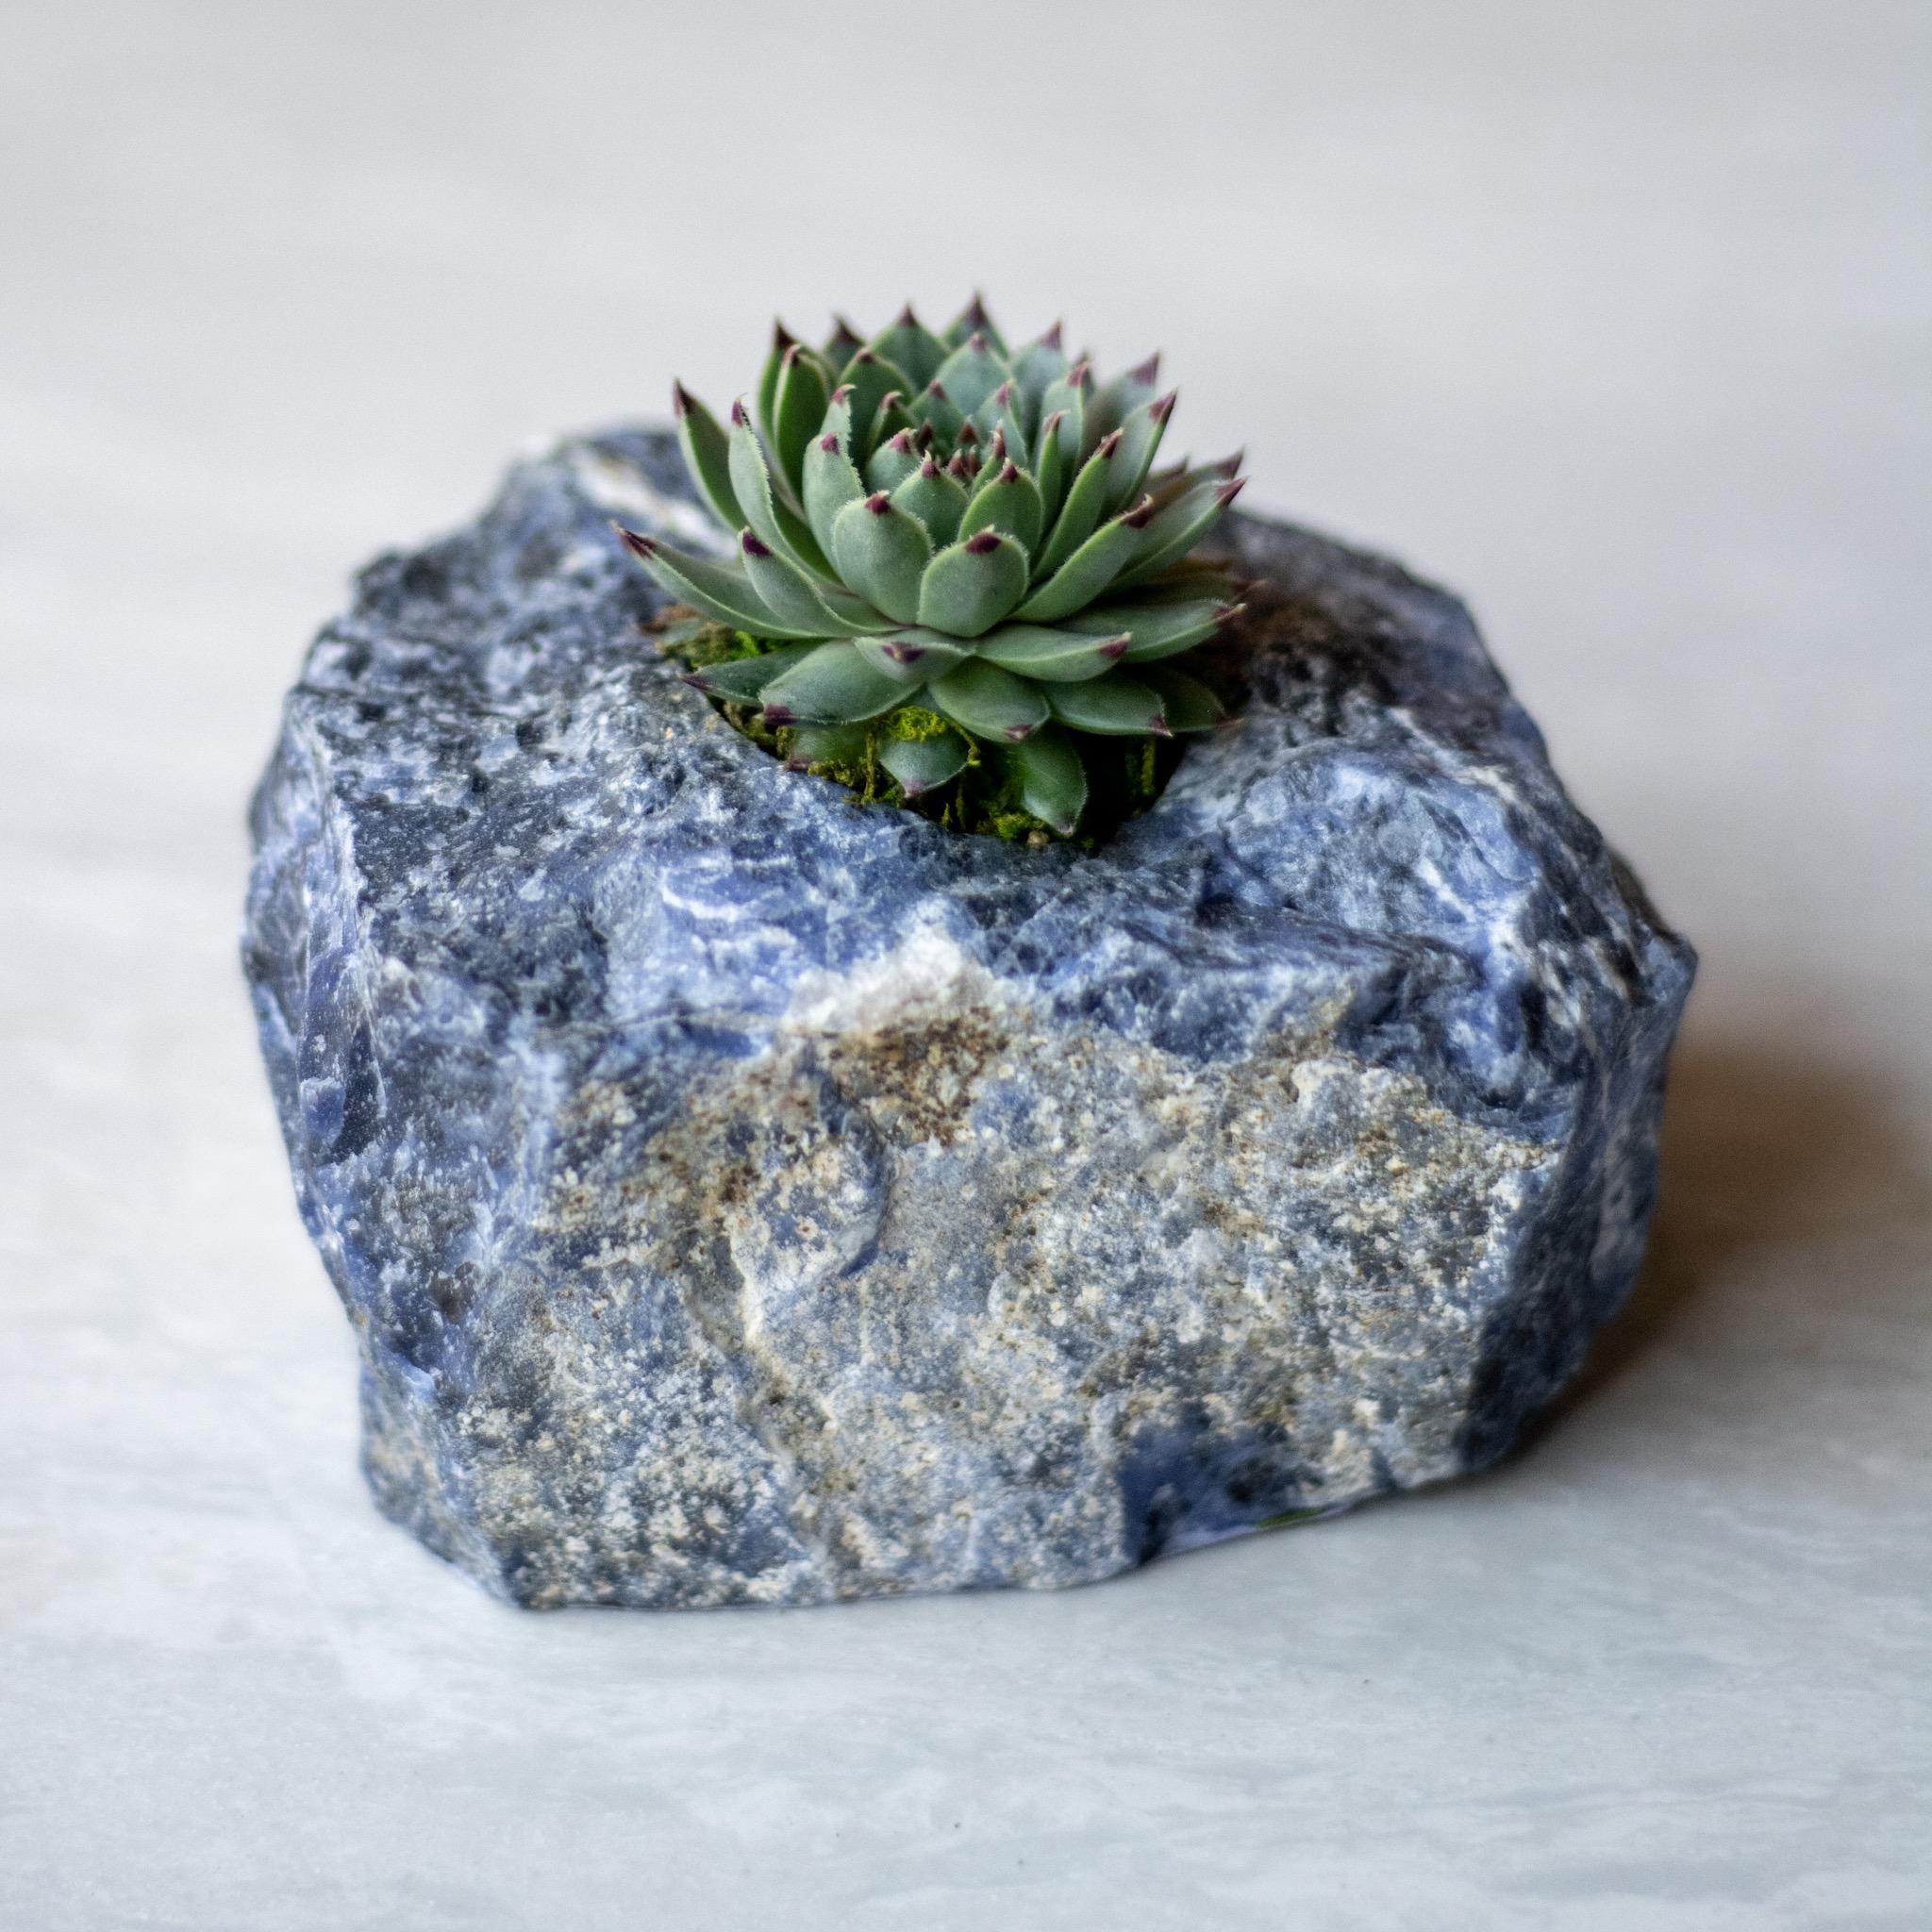 infinitesucculent_crystals_ccbiz_gabaccia__GAB5901.jpg